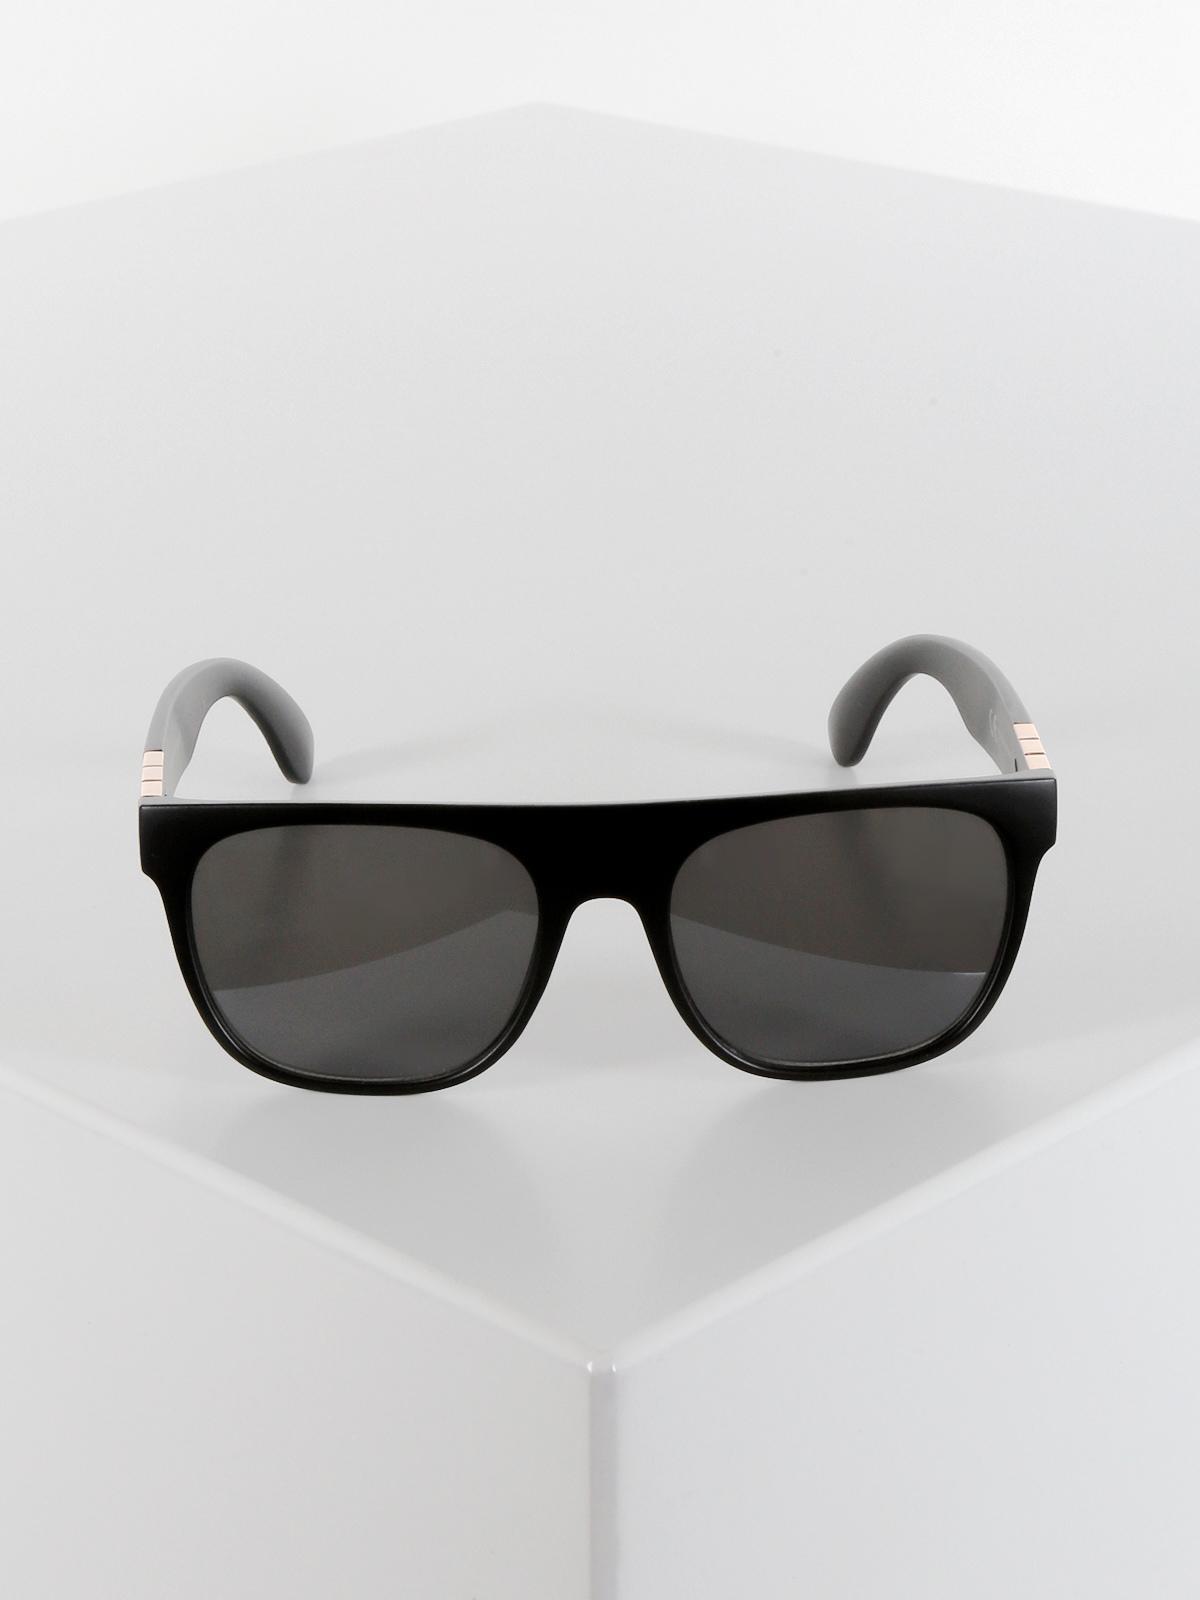 899ed365c1 Occhiali da sole effetto pelle di serpente seevision | MecShopping